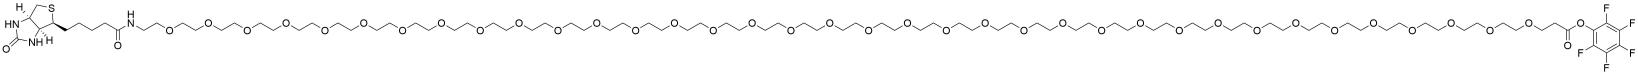 Biotin-PEG36-PFP ester